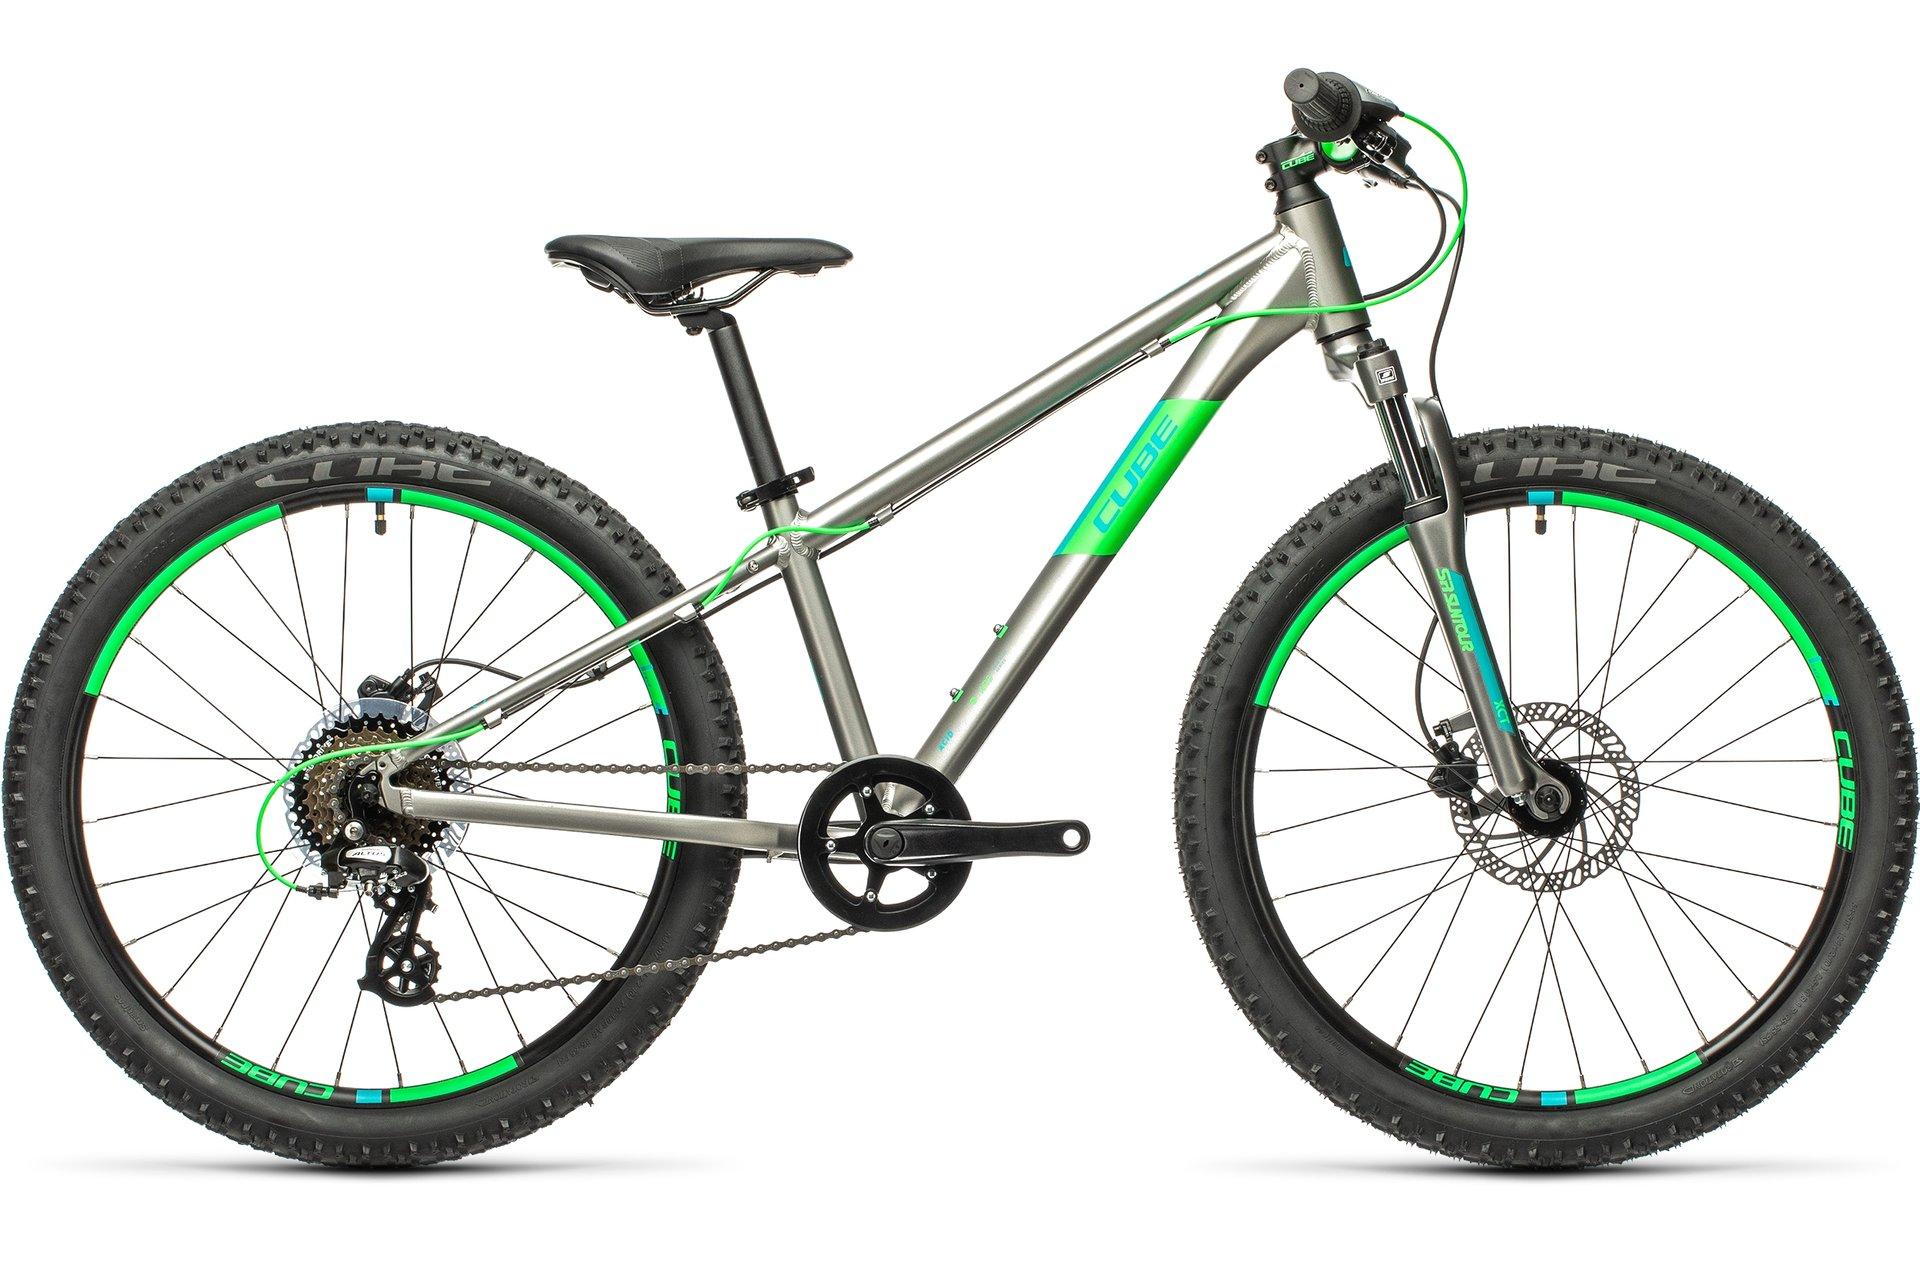 Cube Acid 240 Disc 2021 24 Zoll günstig kaufen   Fahrrad XXL